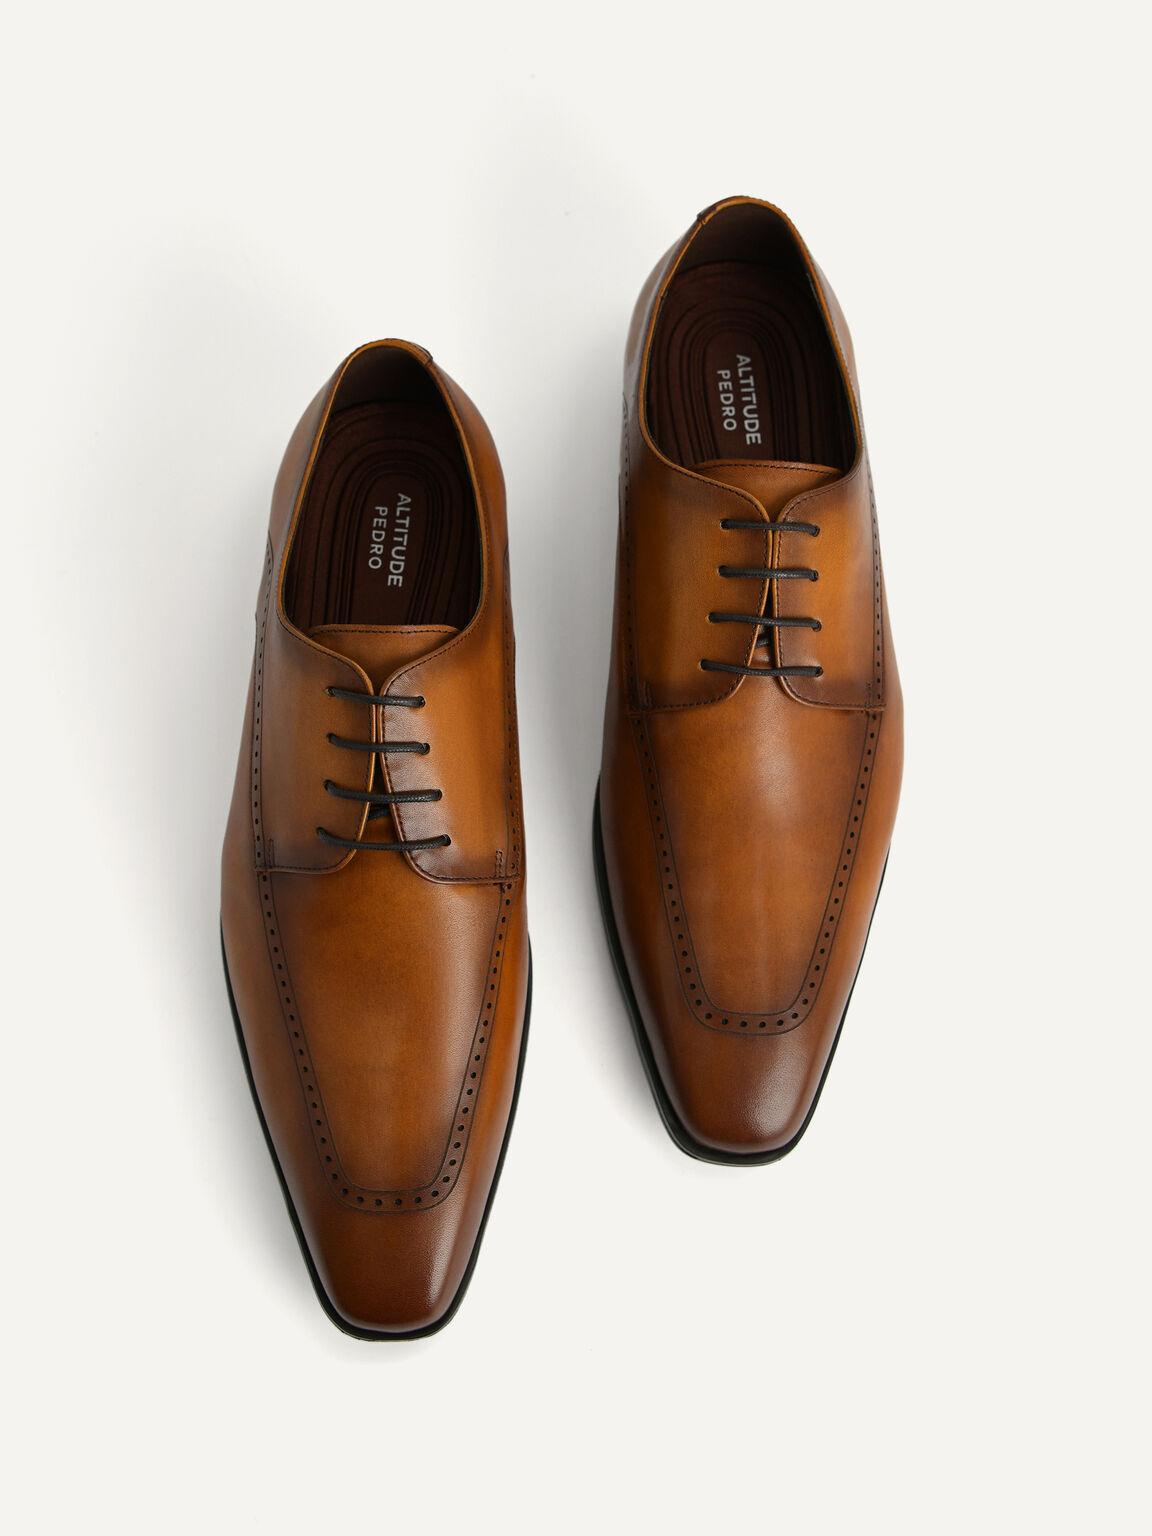 Altitude Leather Brogue Derby Shoes, Cognac, hi-res